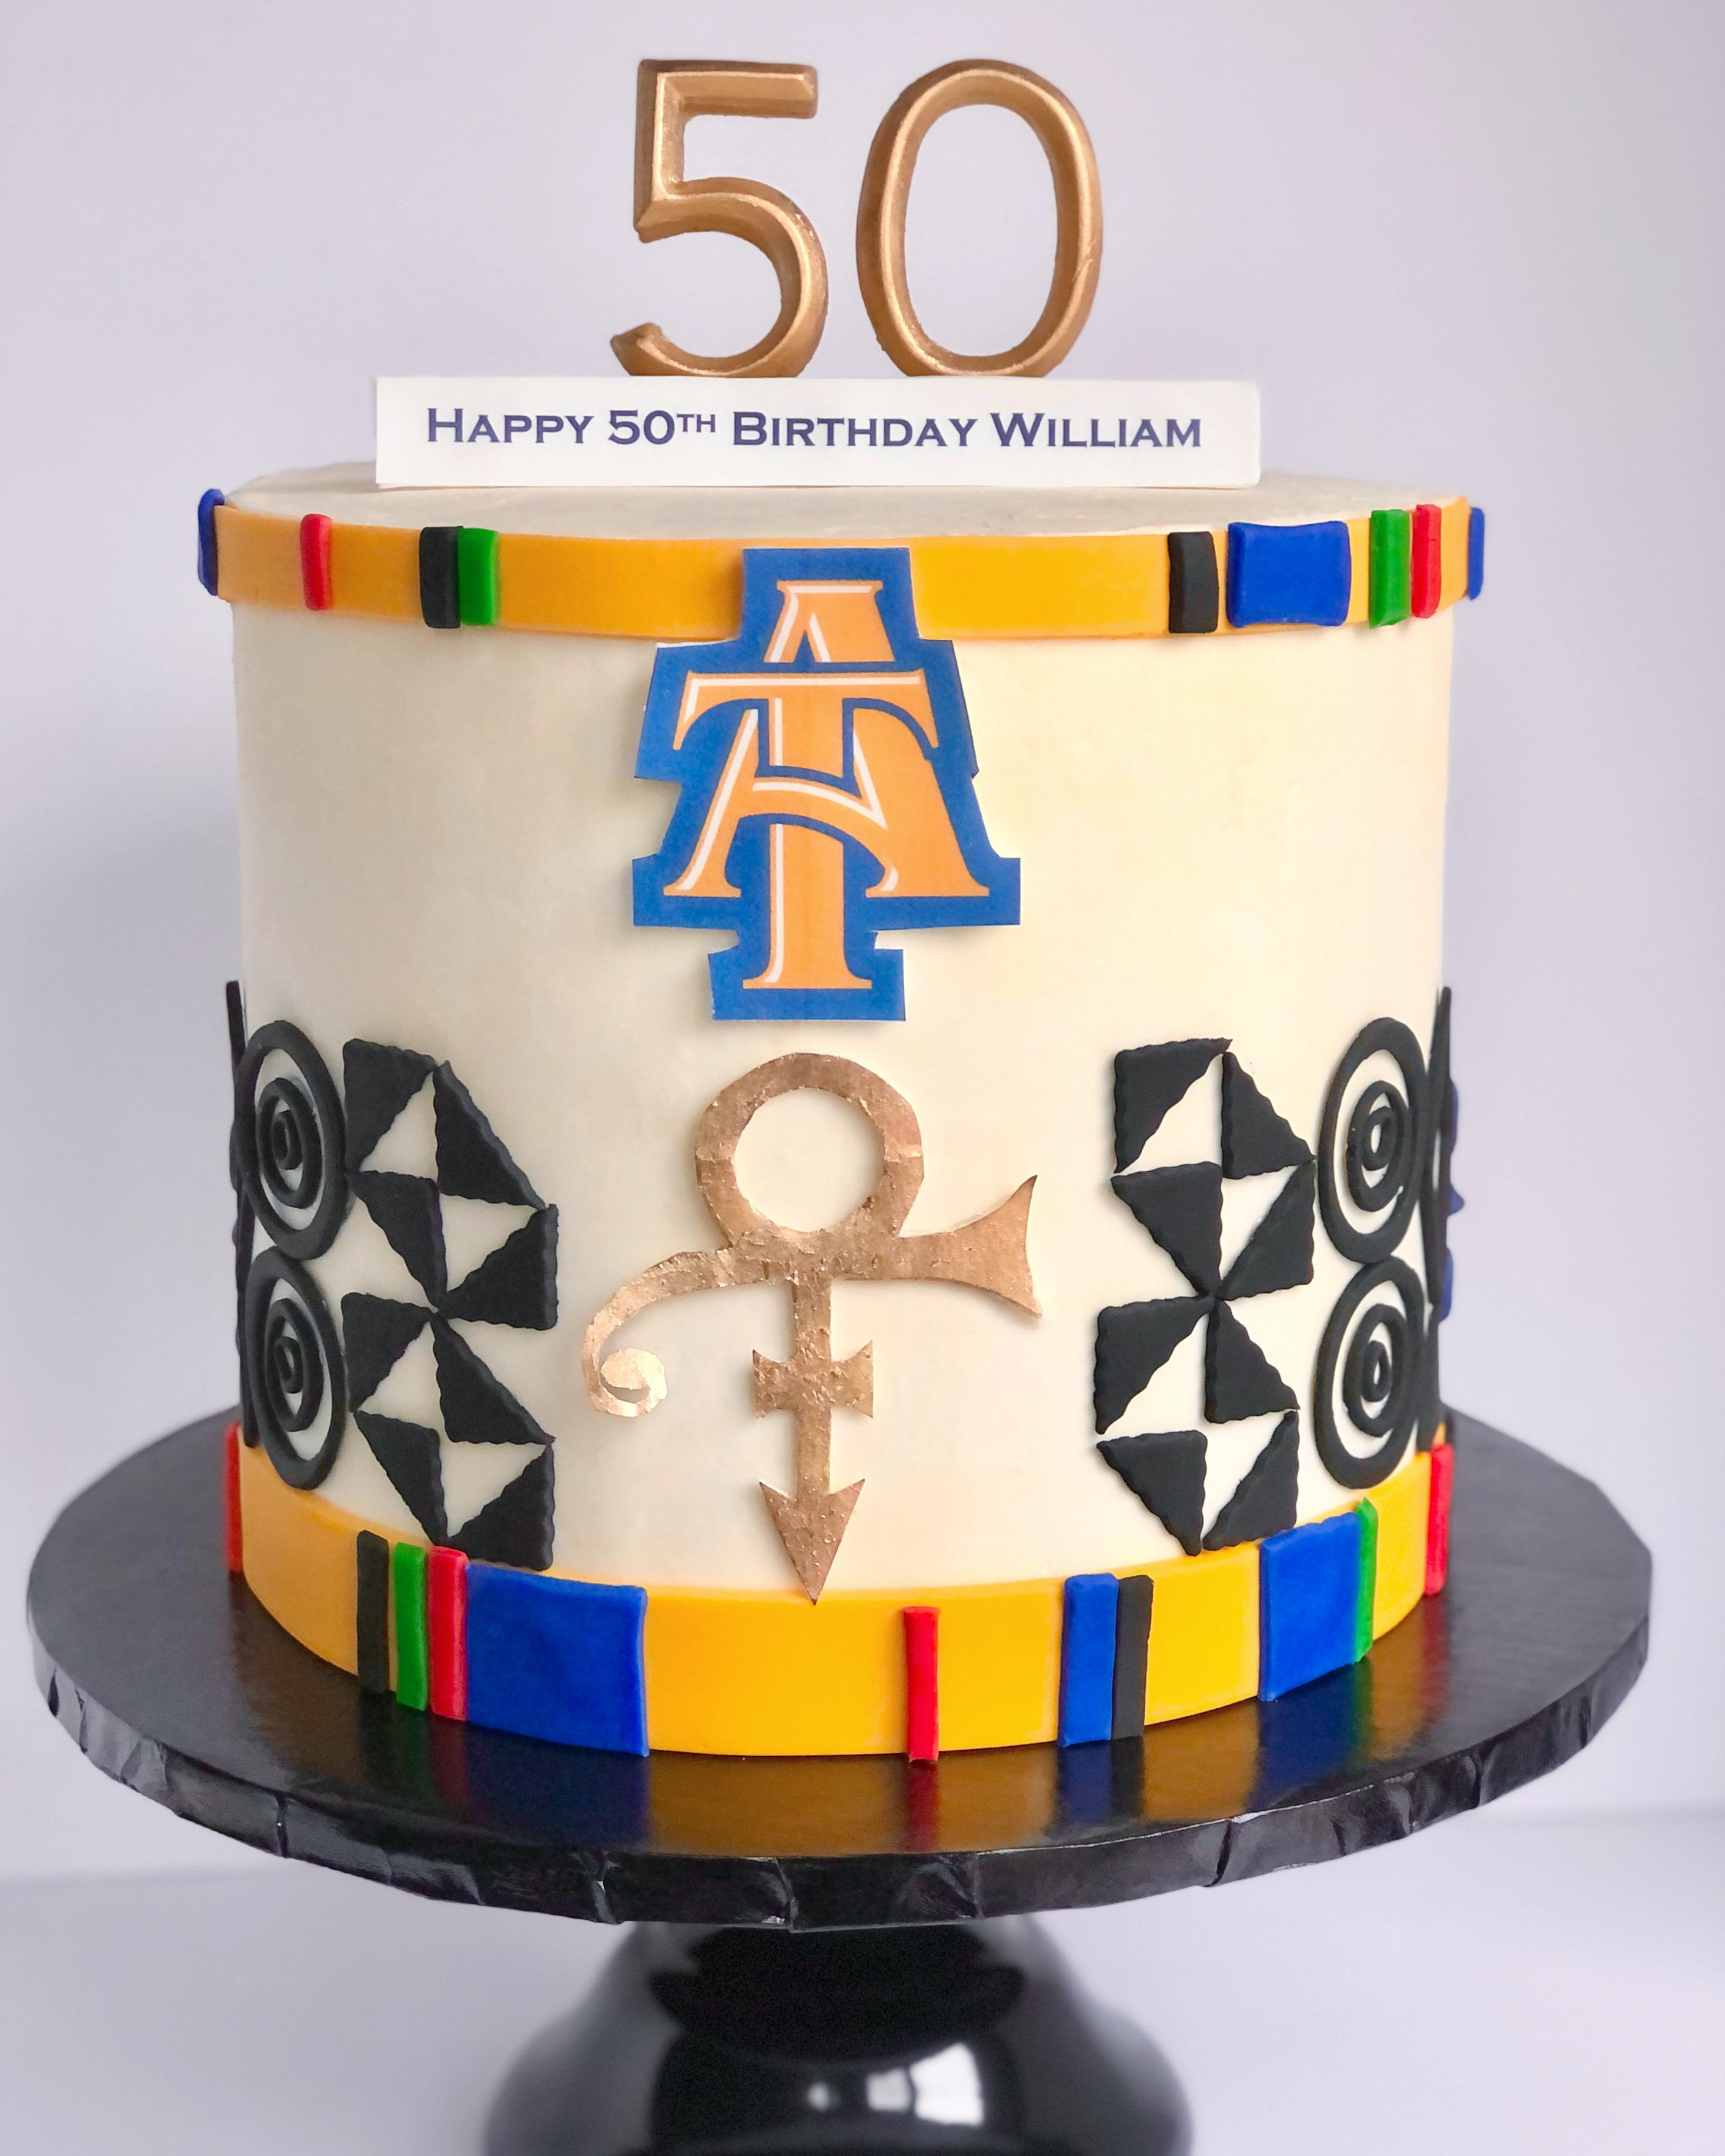 Kente Cloth Themed 50th Birthday Cake